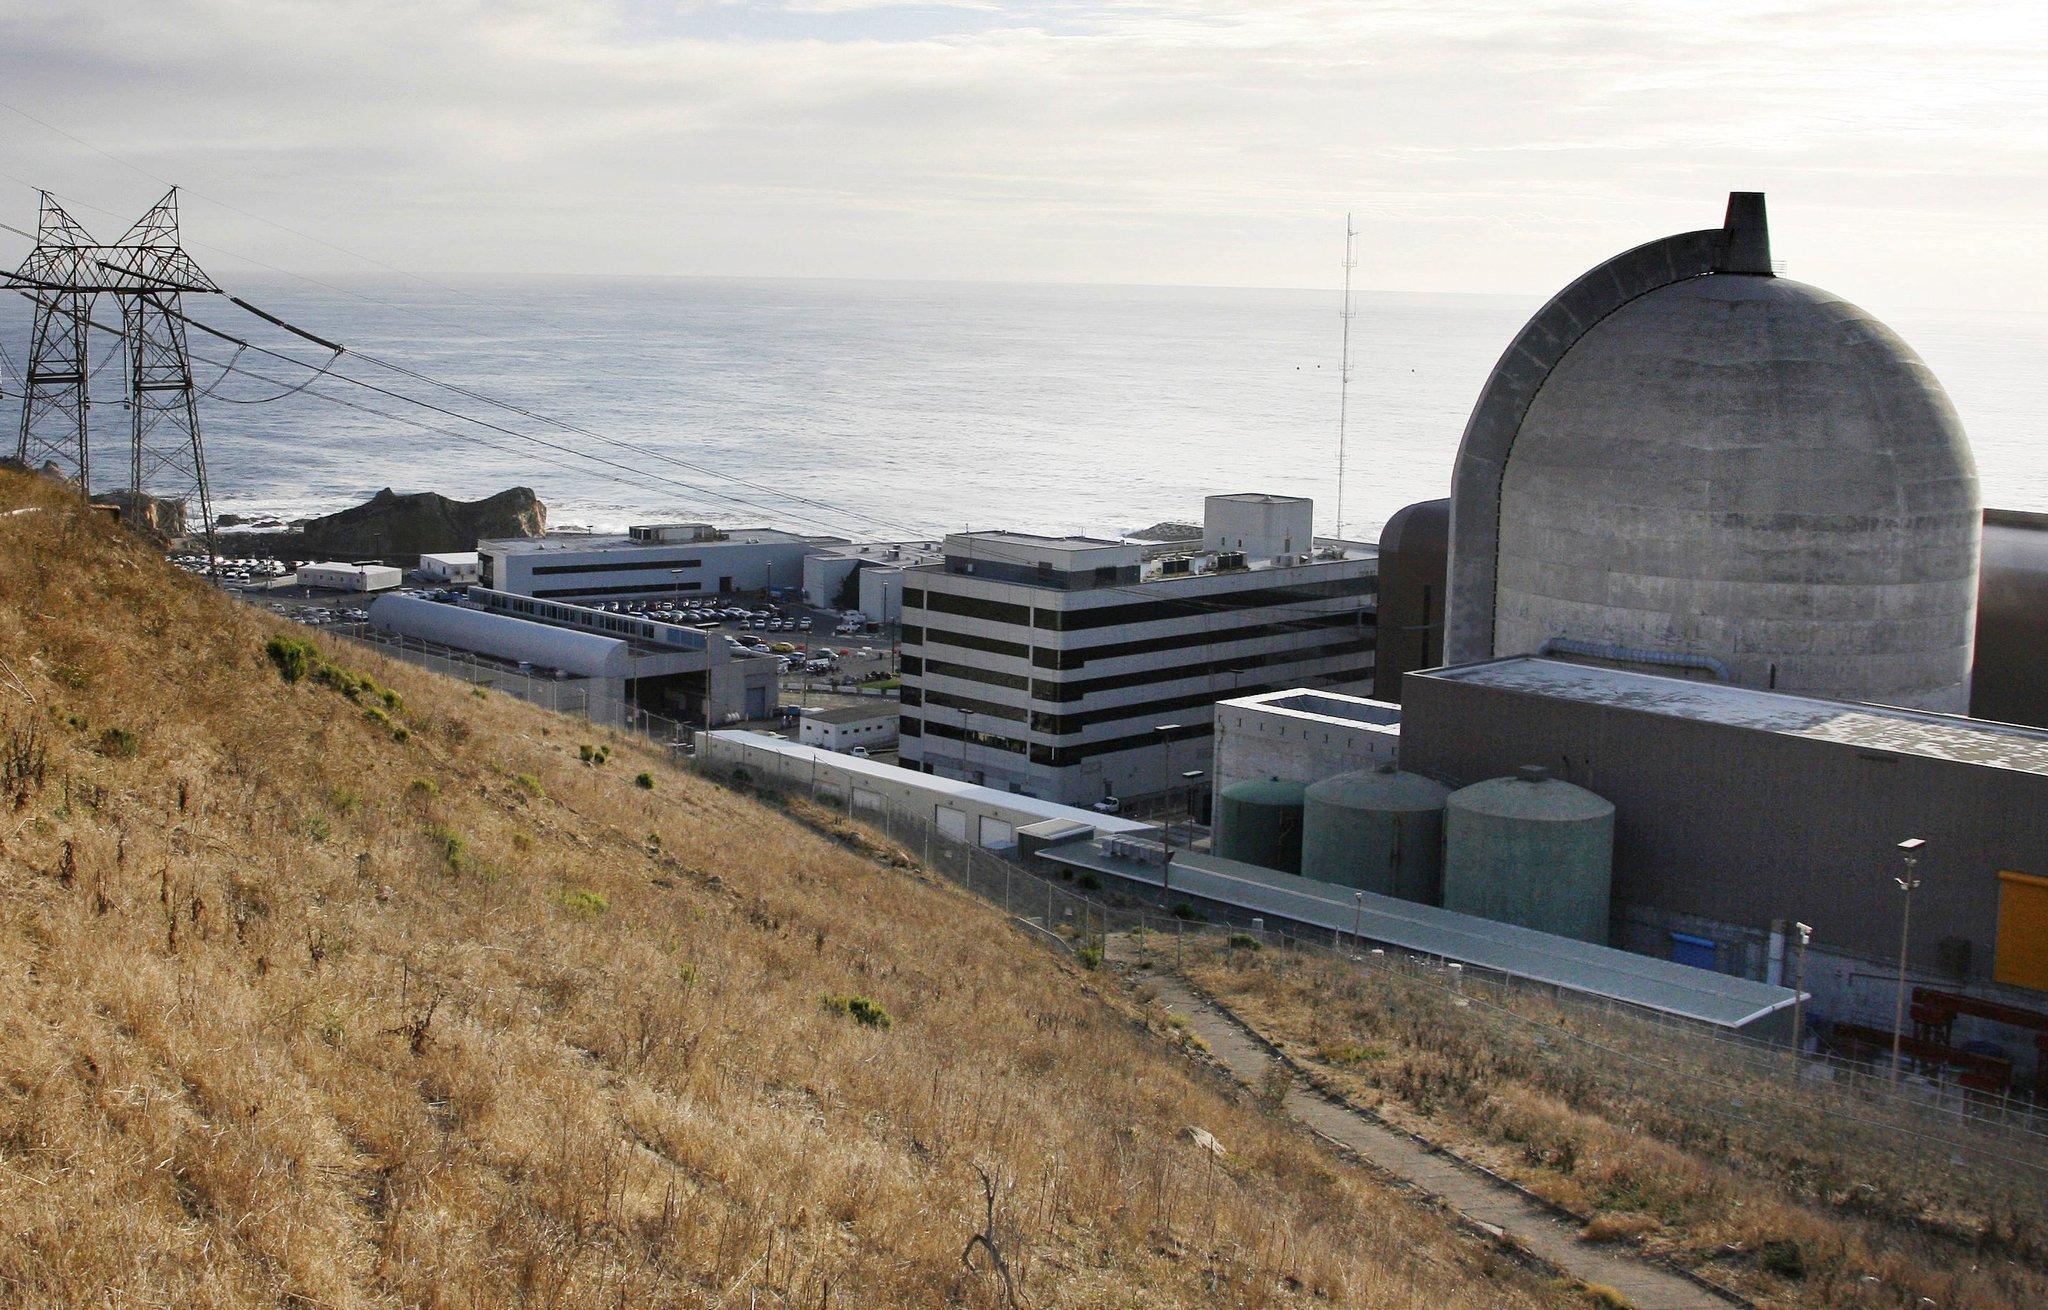 Last nuclear plant in California closing The San Diego Union Tribune